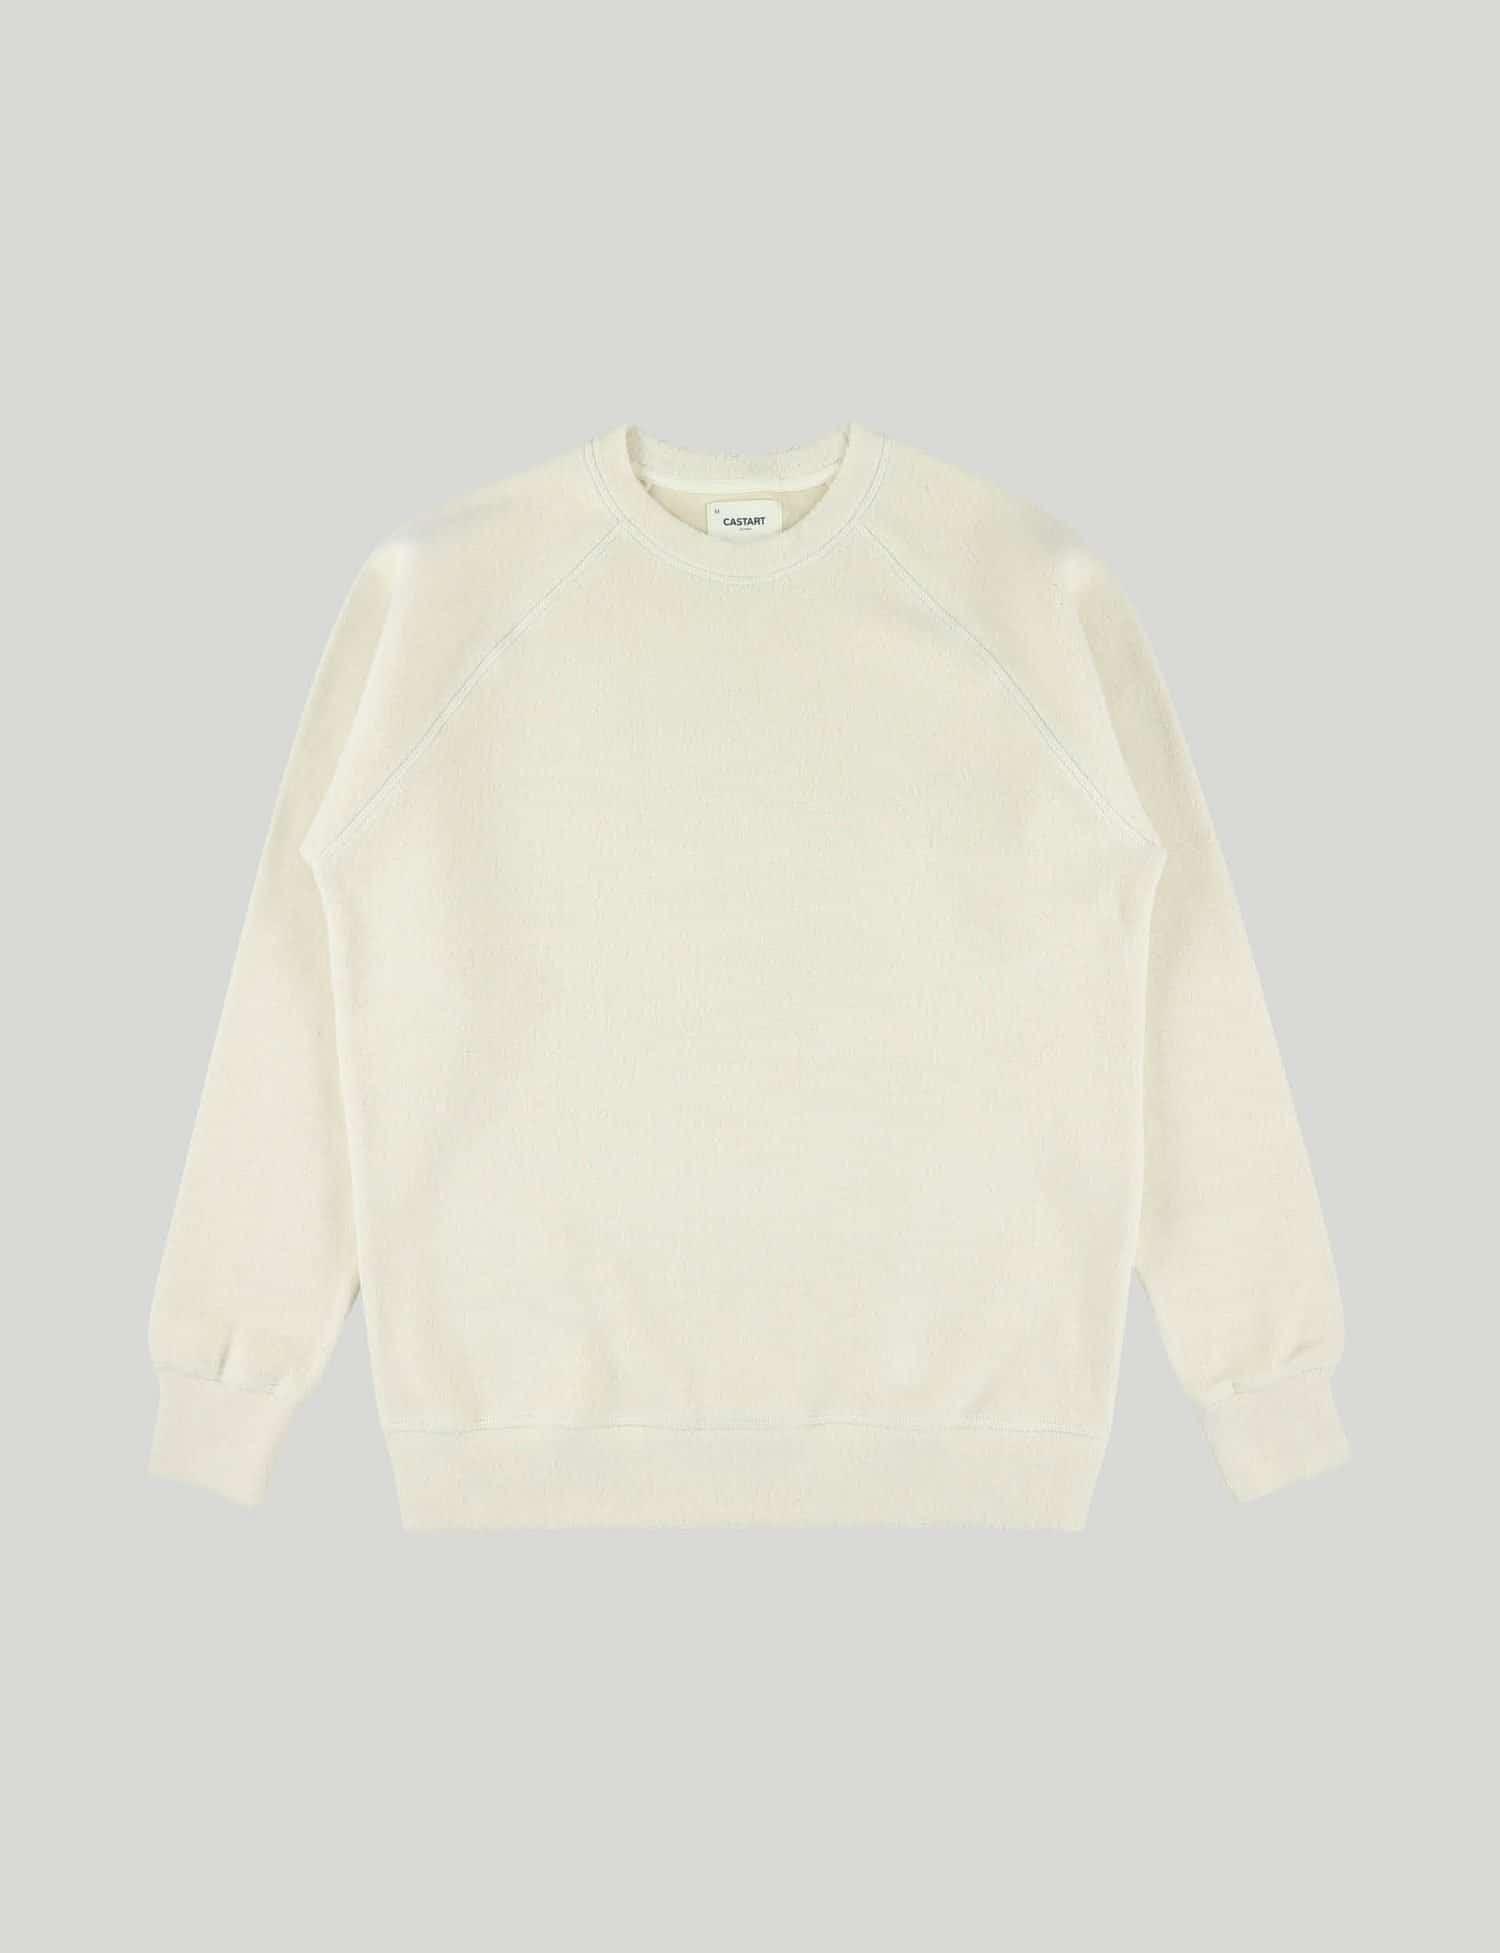 Castart - Maitake Sweater - Ecru